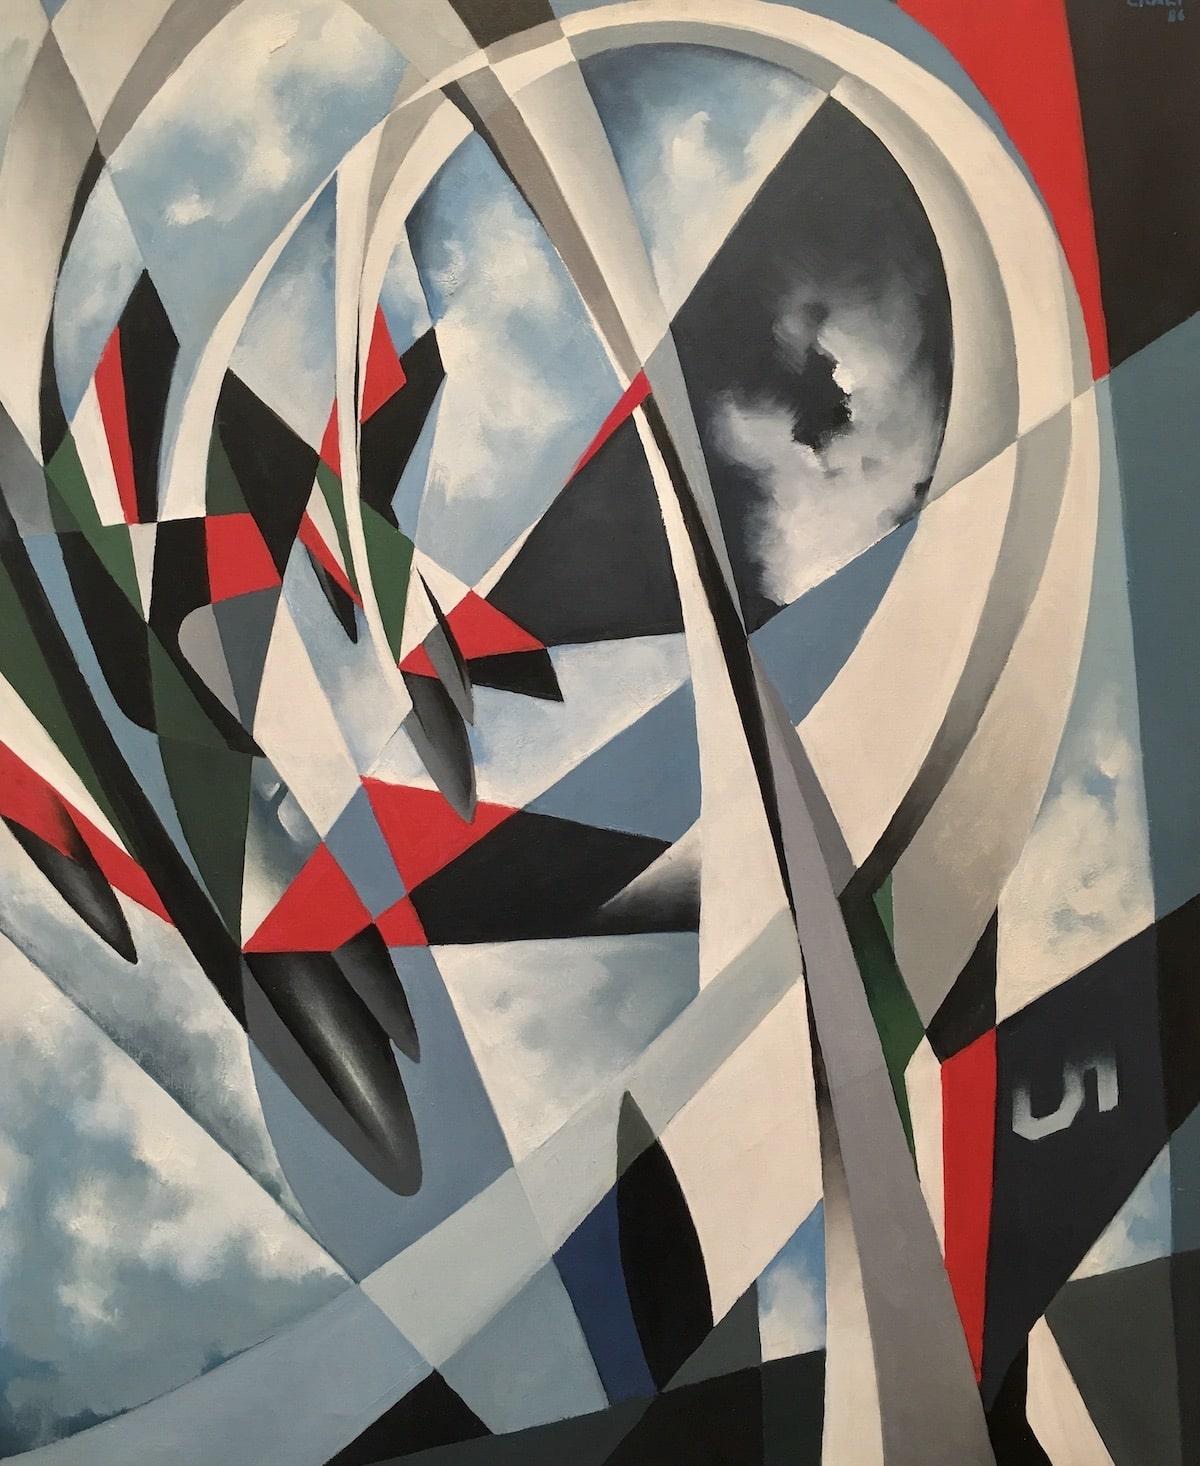 Tullio Crali: A Futurist Life - The Estorick Collection, London